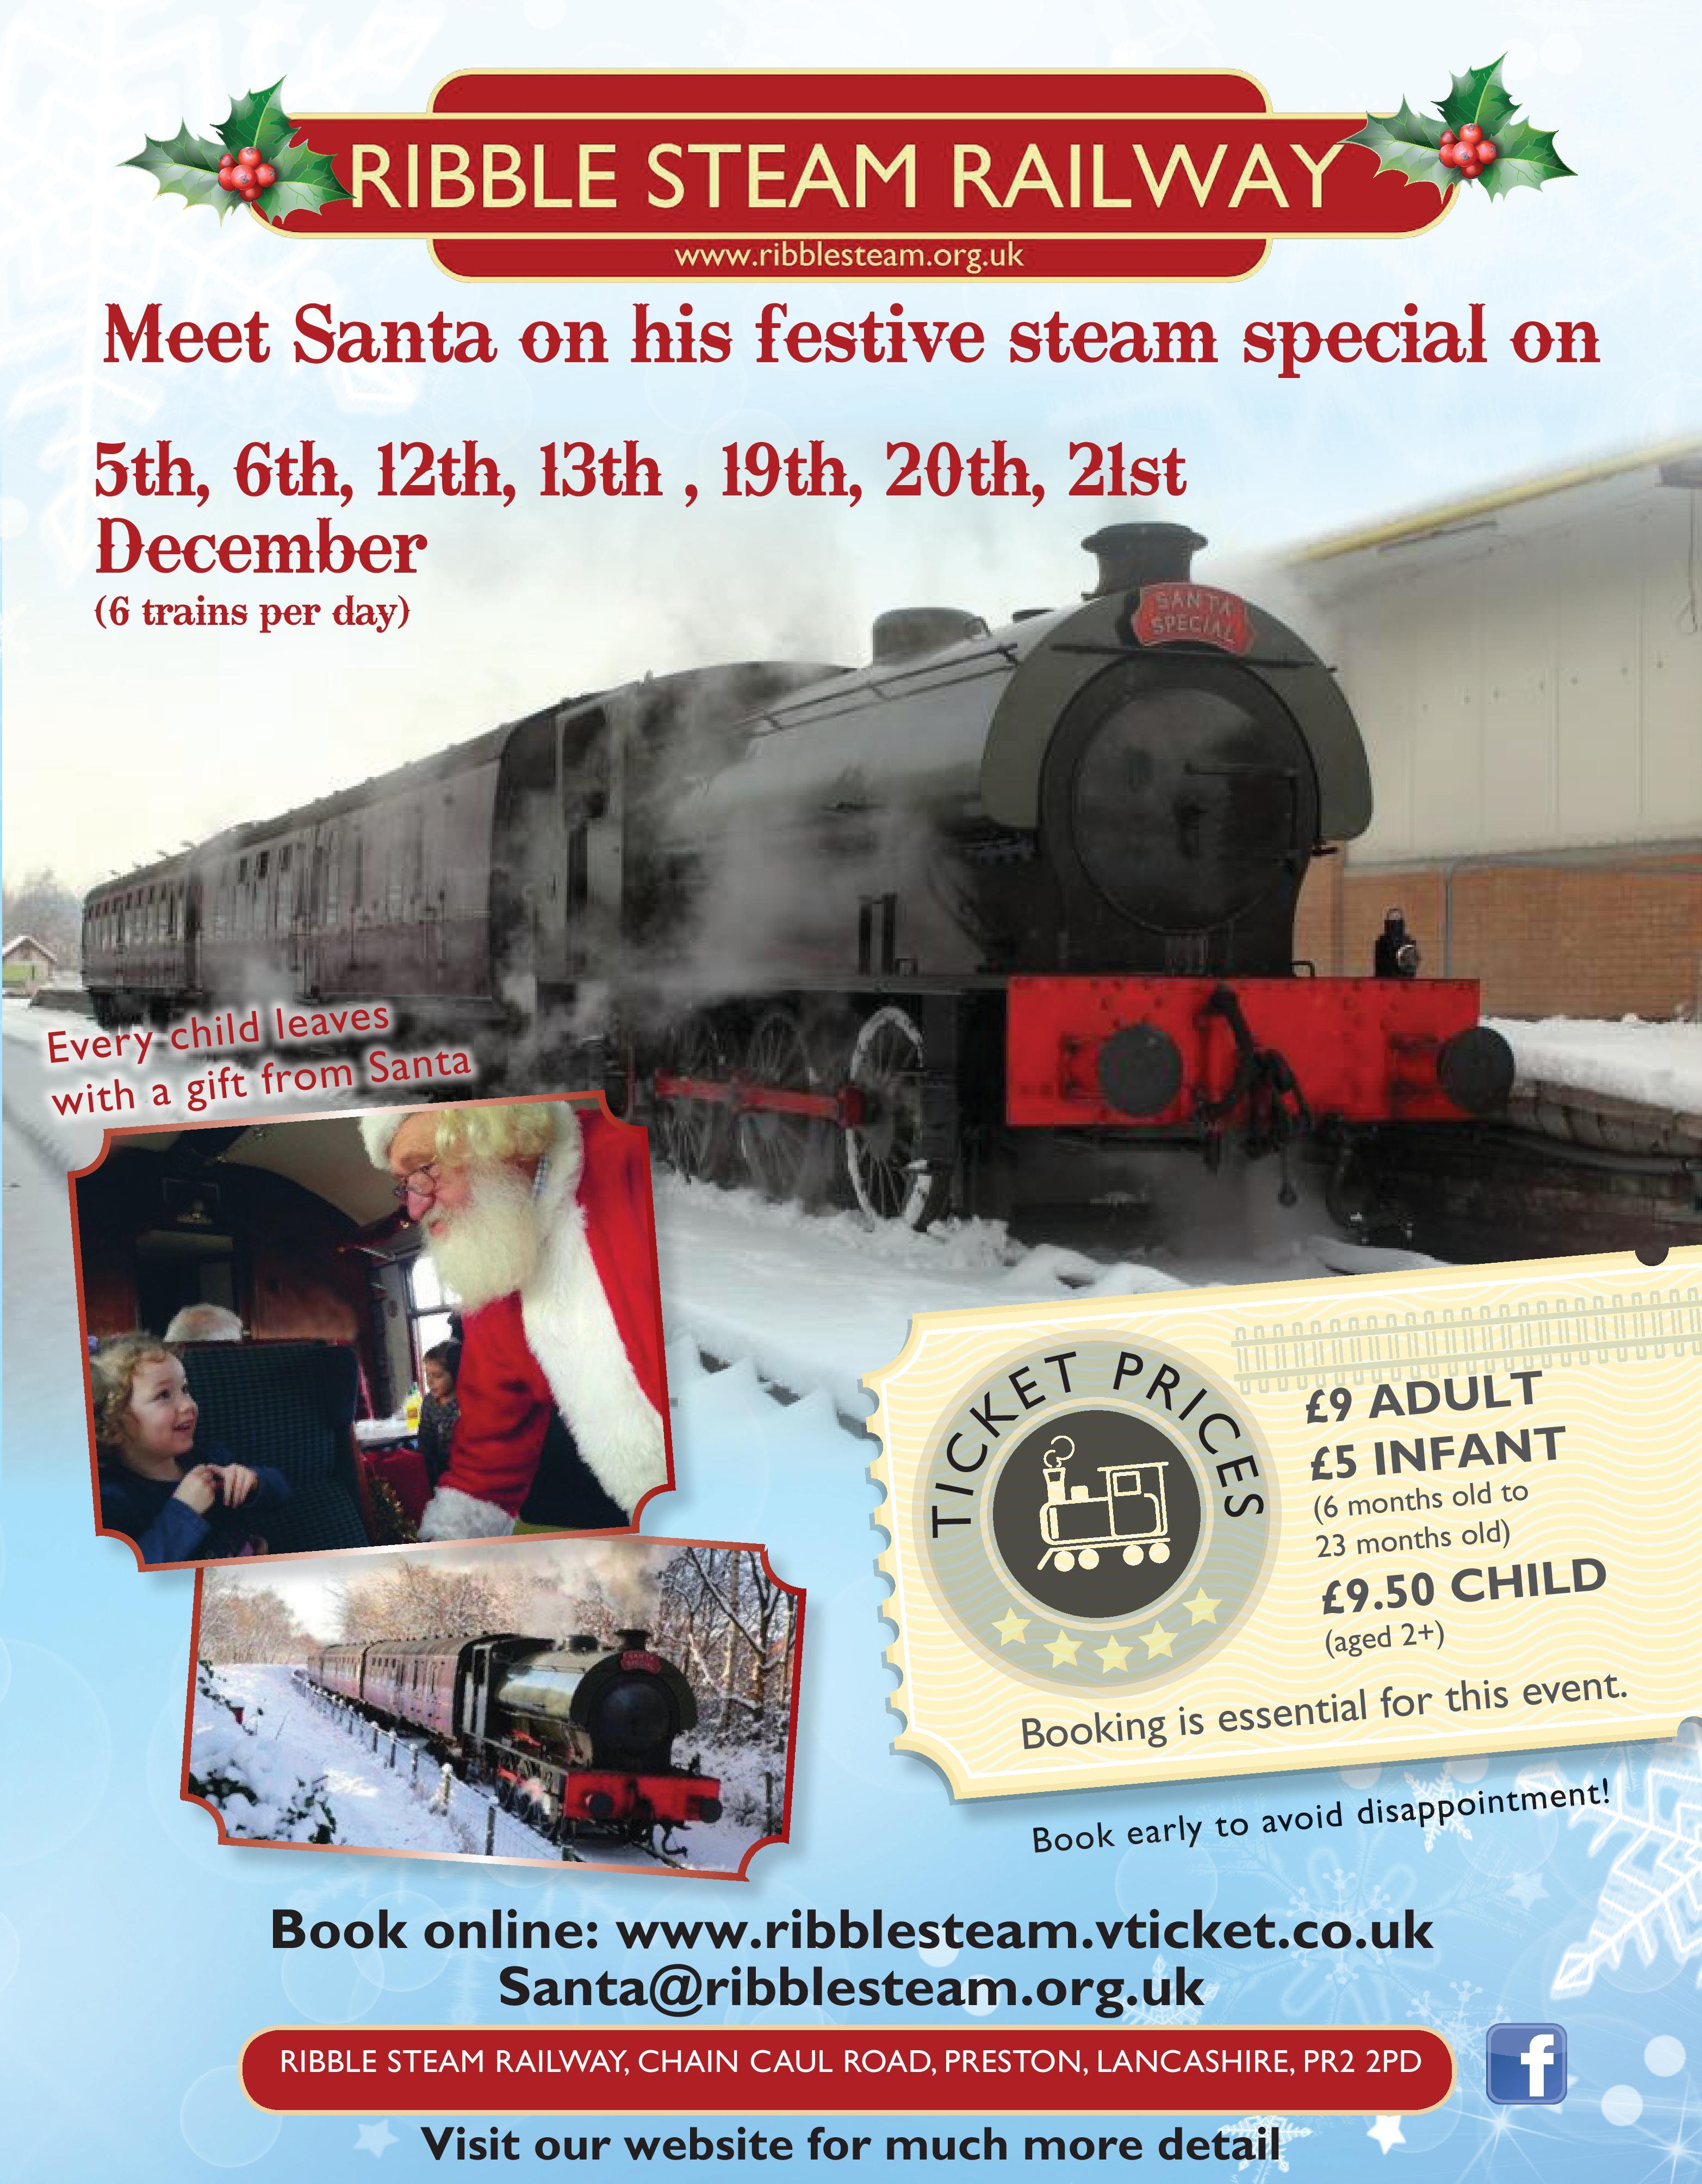 Ribble Steam Railway Santa Specials 2015